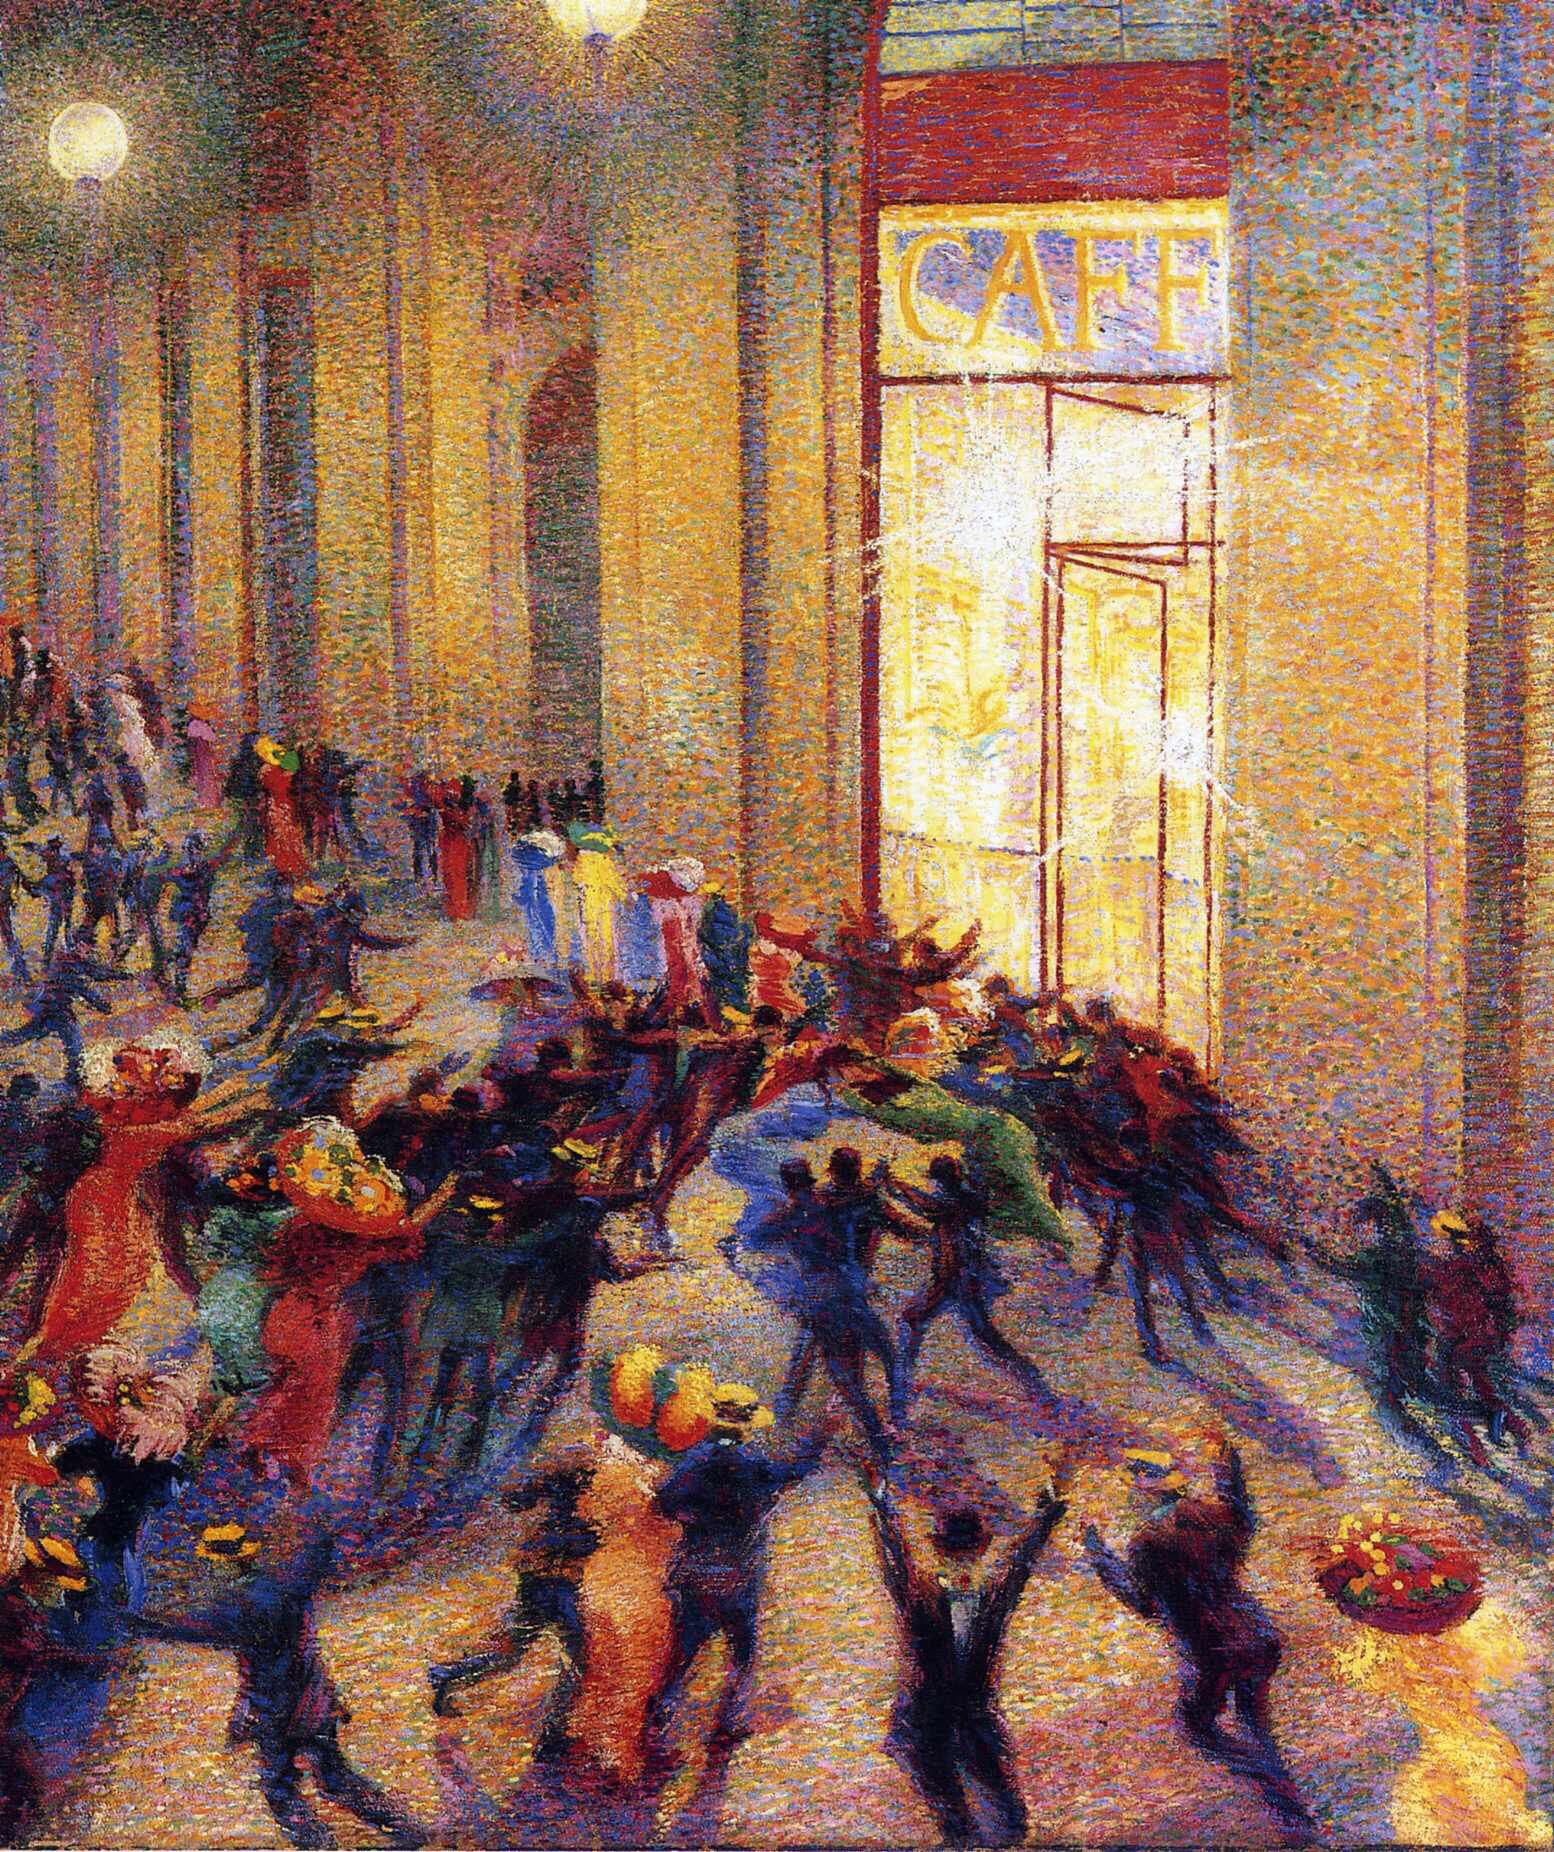 The Riot at the Galleria - Umberto Boccioni